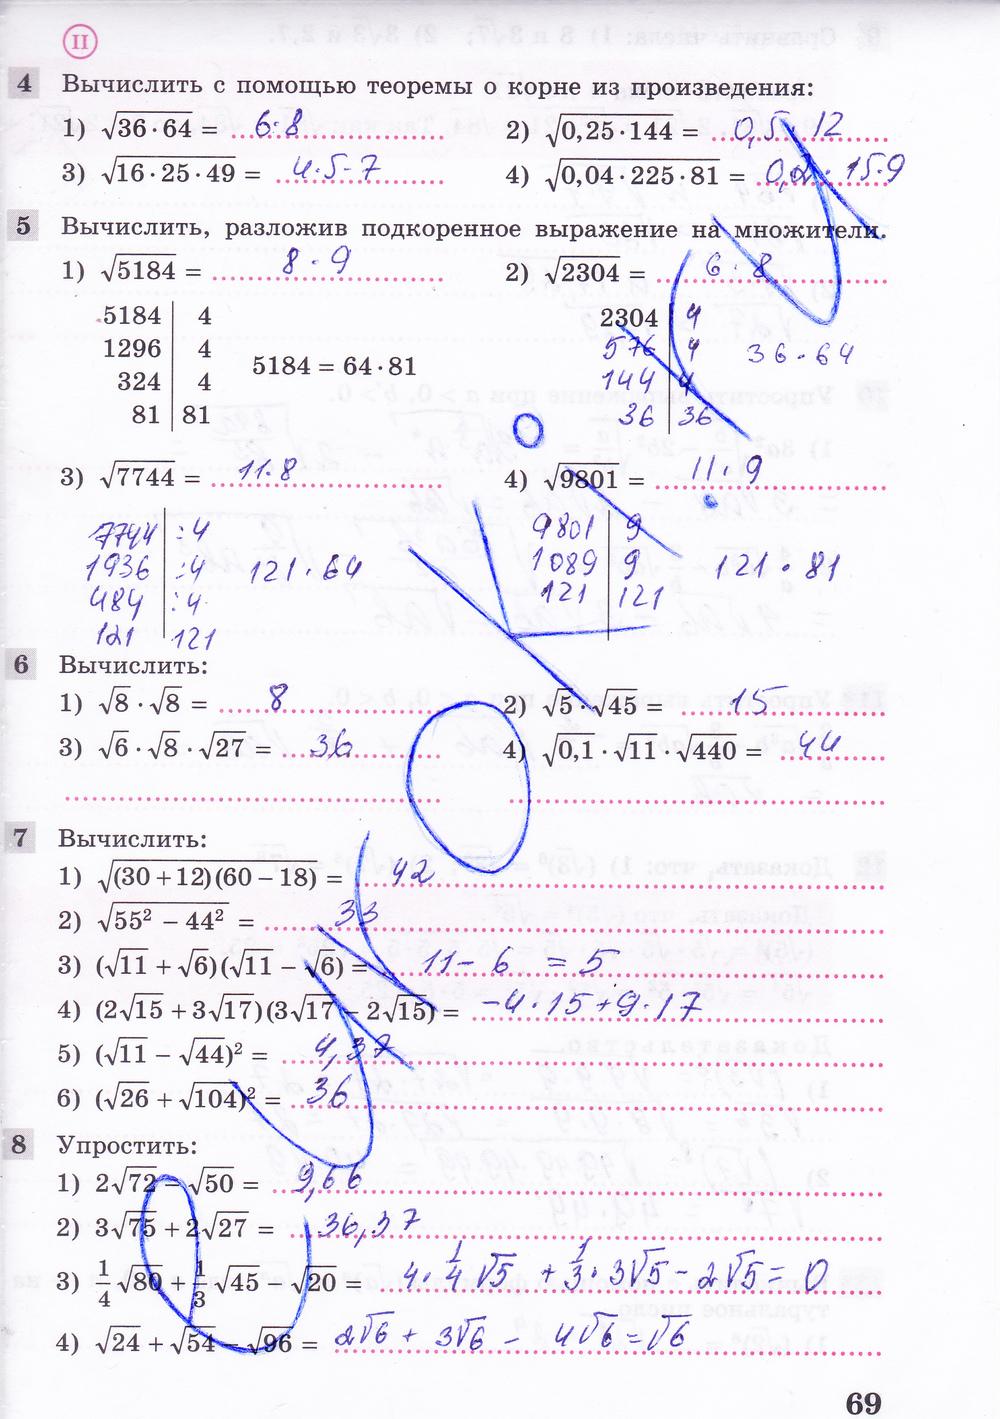 Гдз по алгебре 8 класс рабочая тетрадь колягин ткачева тетрадь